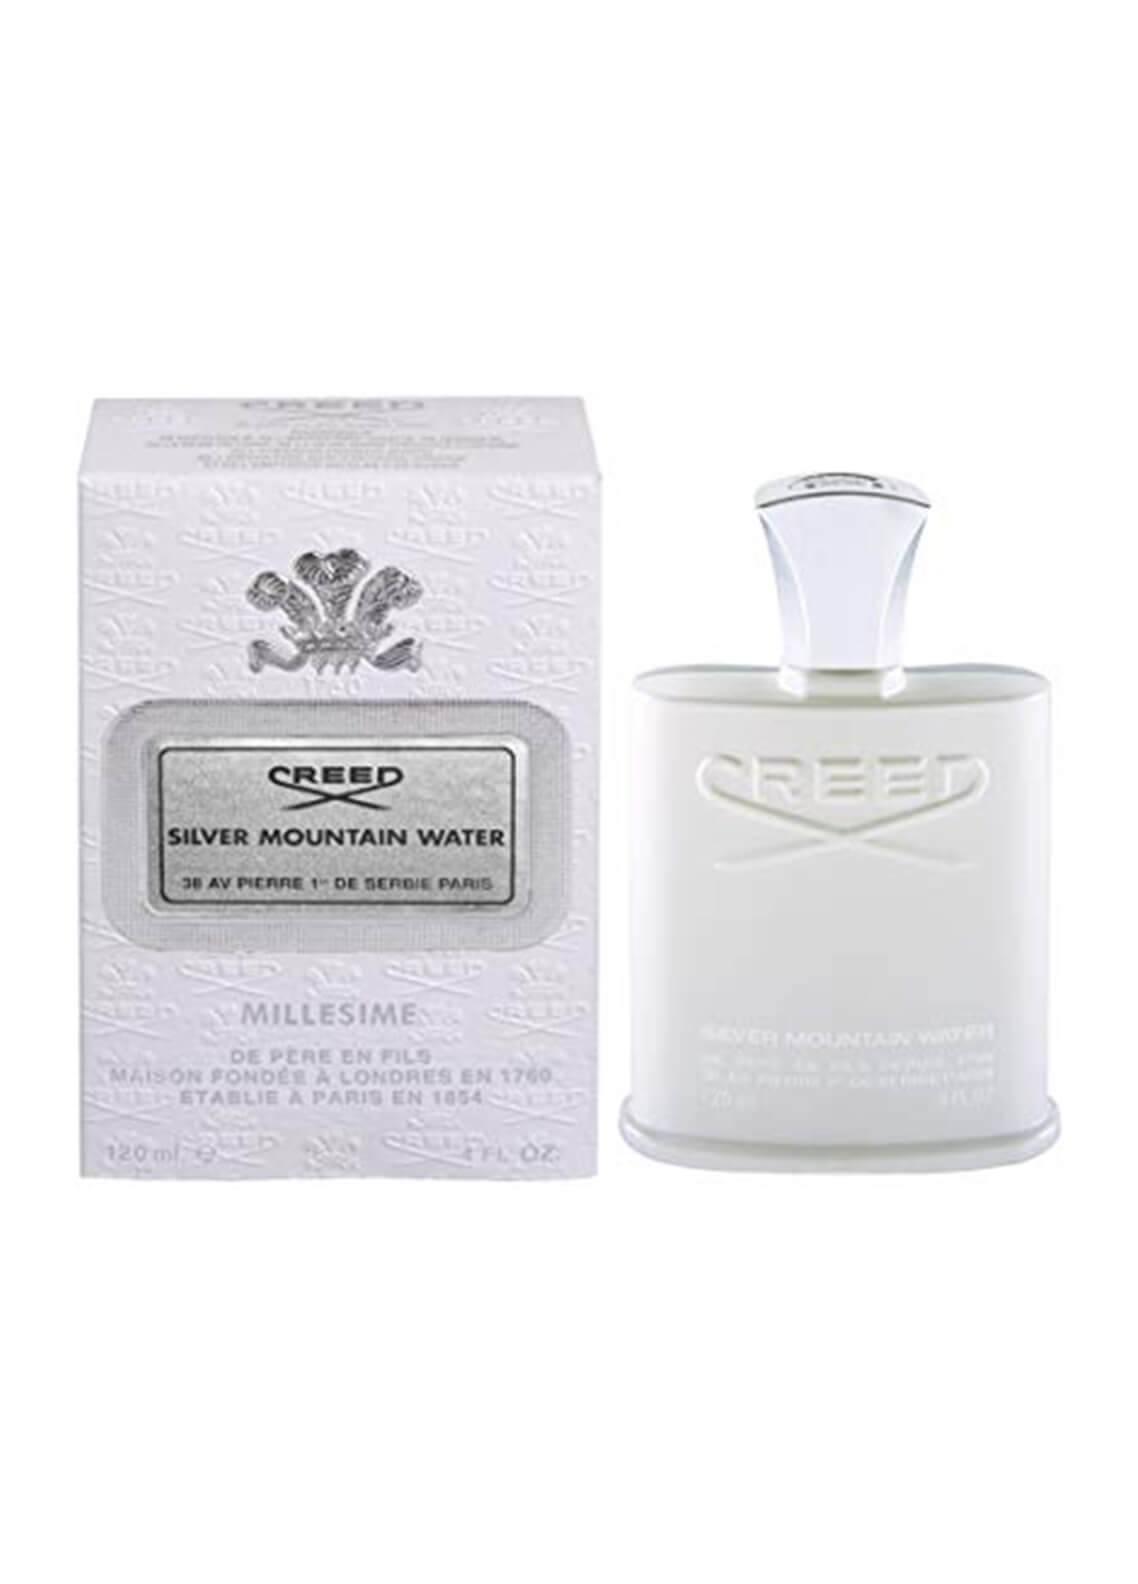 Creed Creed Silver Mountain Water men's perfume